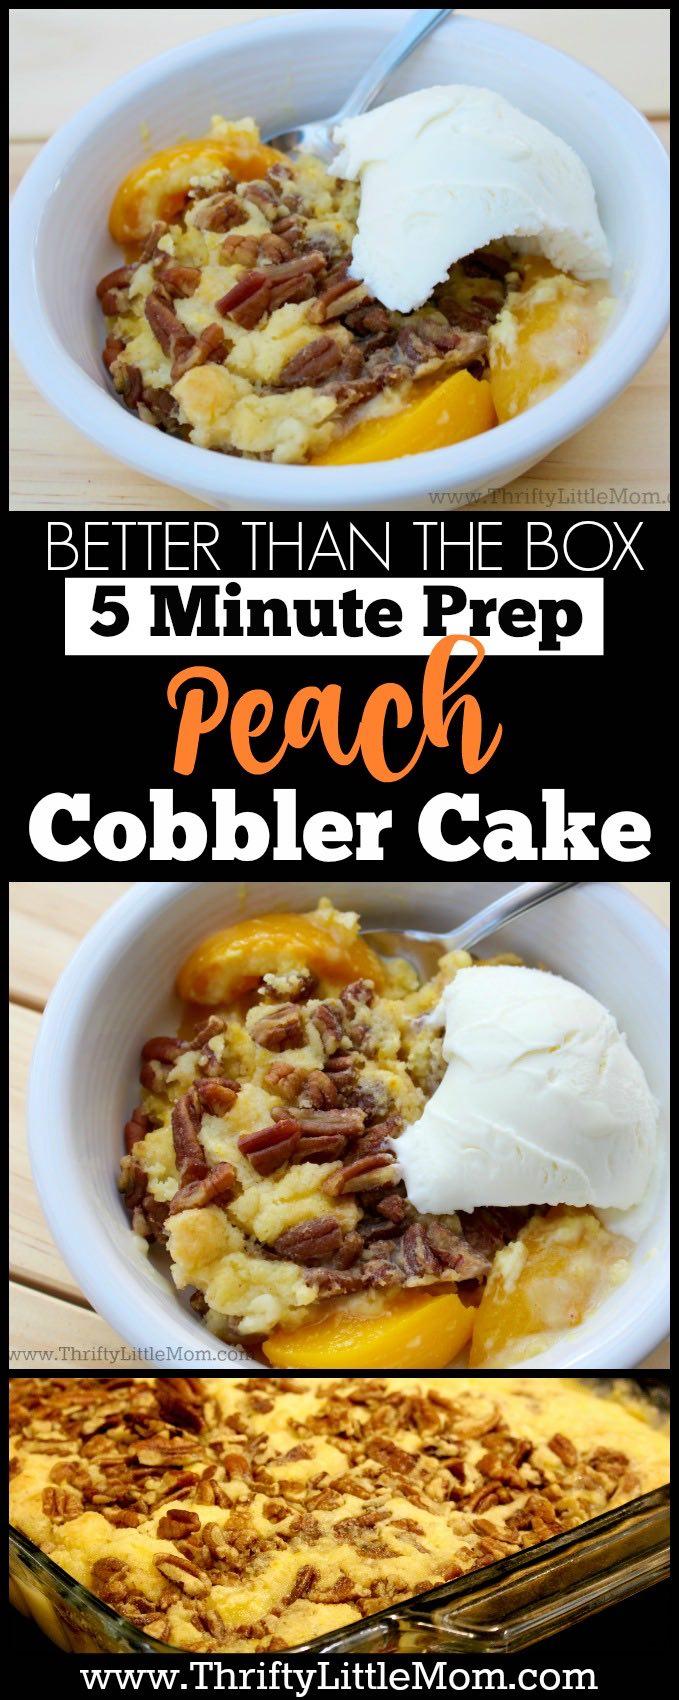 5 minute prep peach cobbler cake